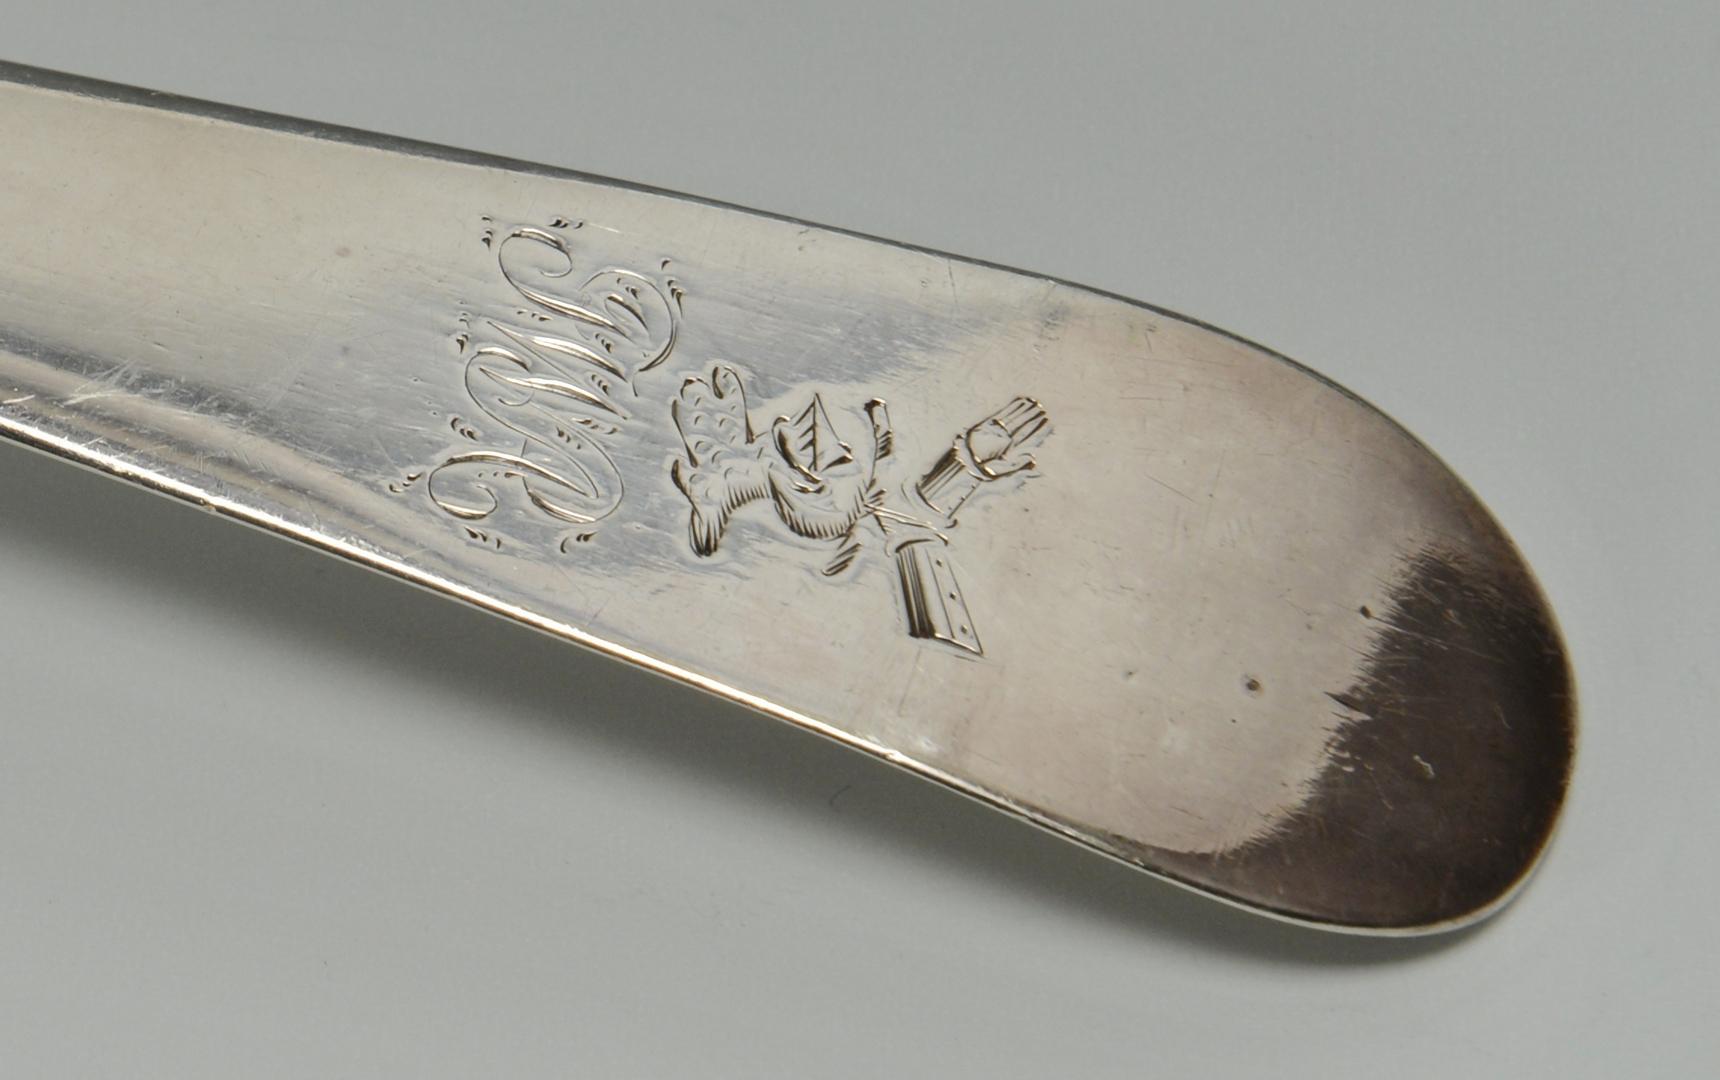 Lot 3088084: 18th century Irish silver soup ladle, crested